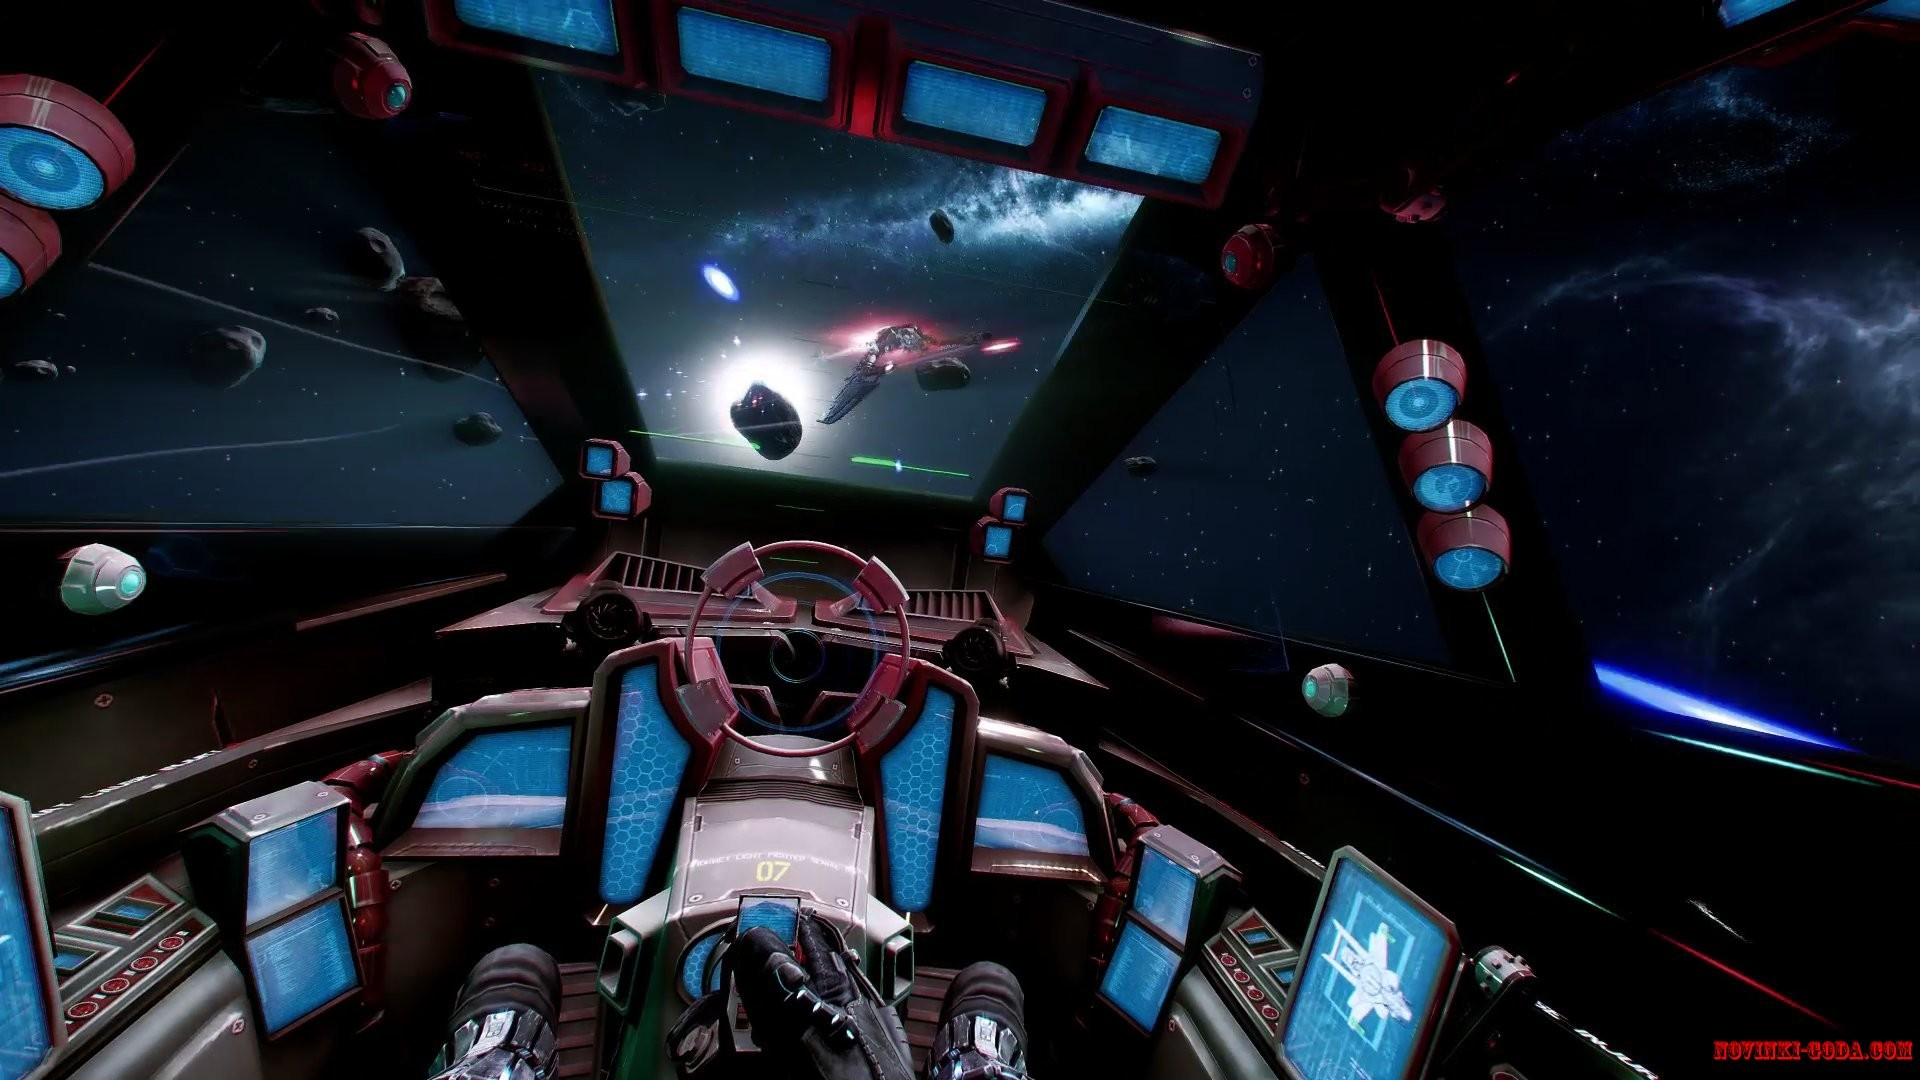 STAR CITIZEN sci-fi spaceship game g wallpaper     167572    WallpaperUP